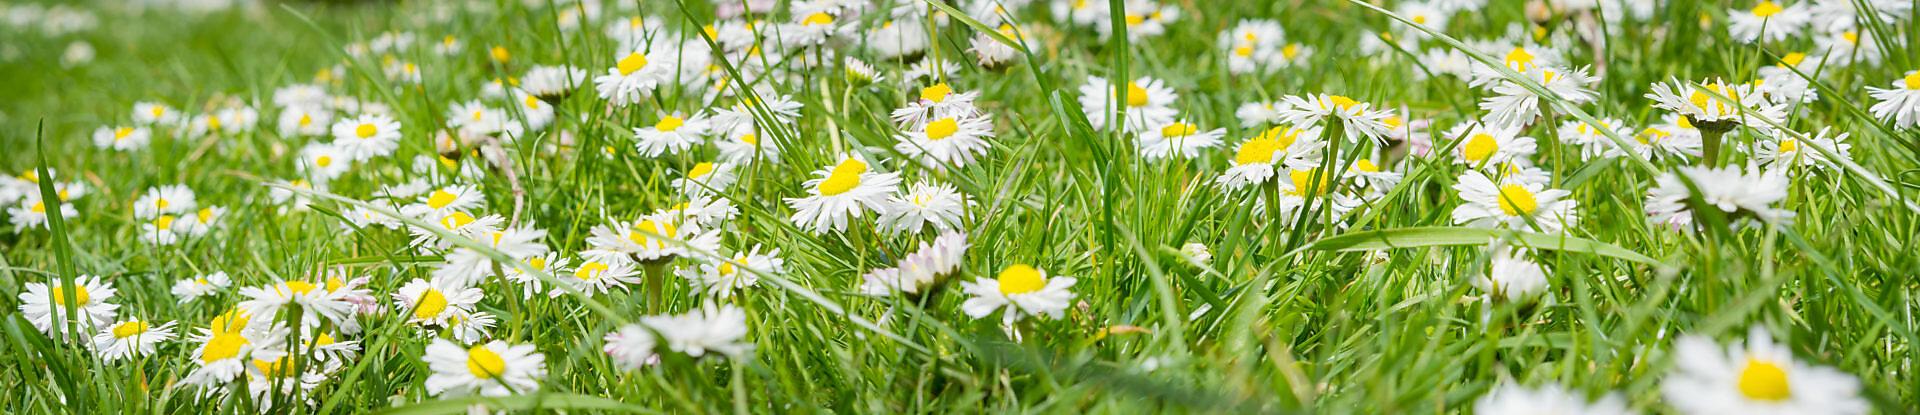 Daisy meadow, banner